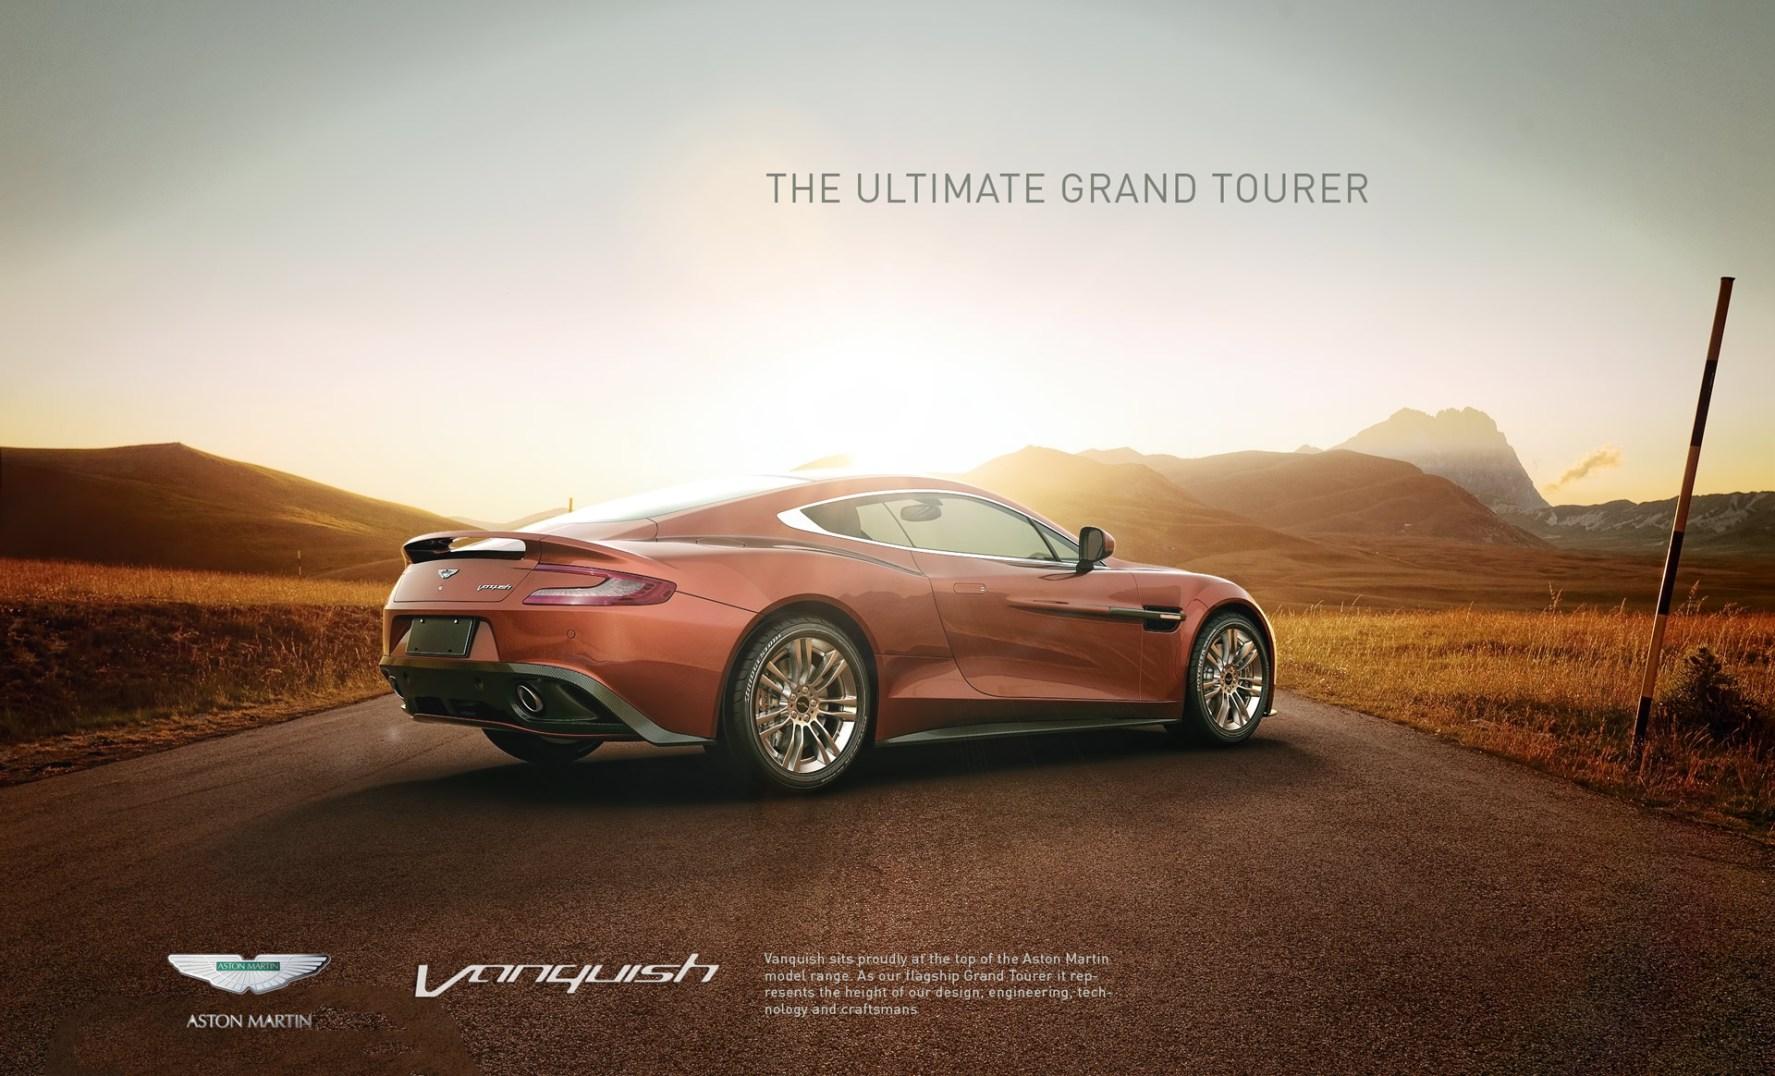 Vanquish 2015 Ad Voxels Creative Production House